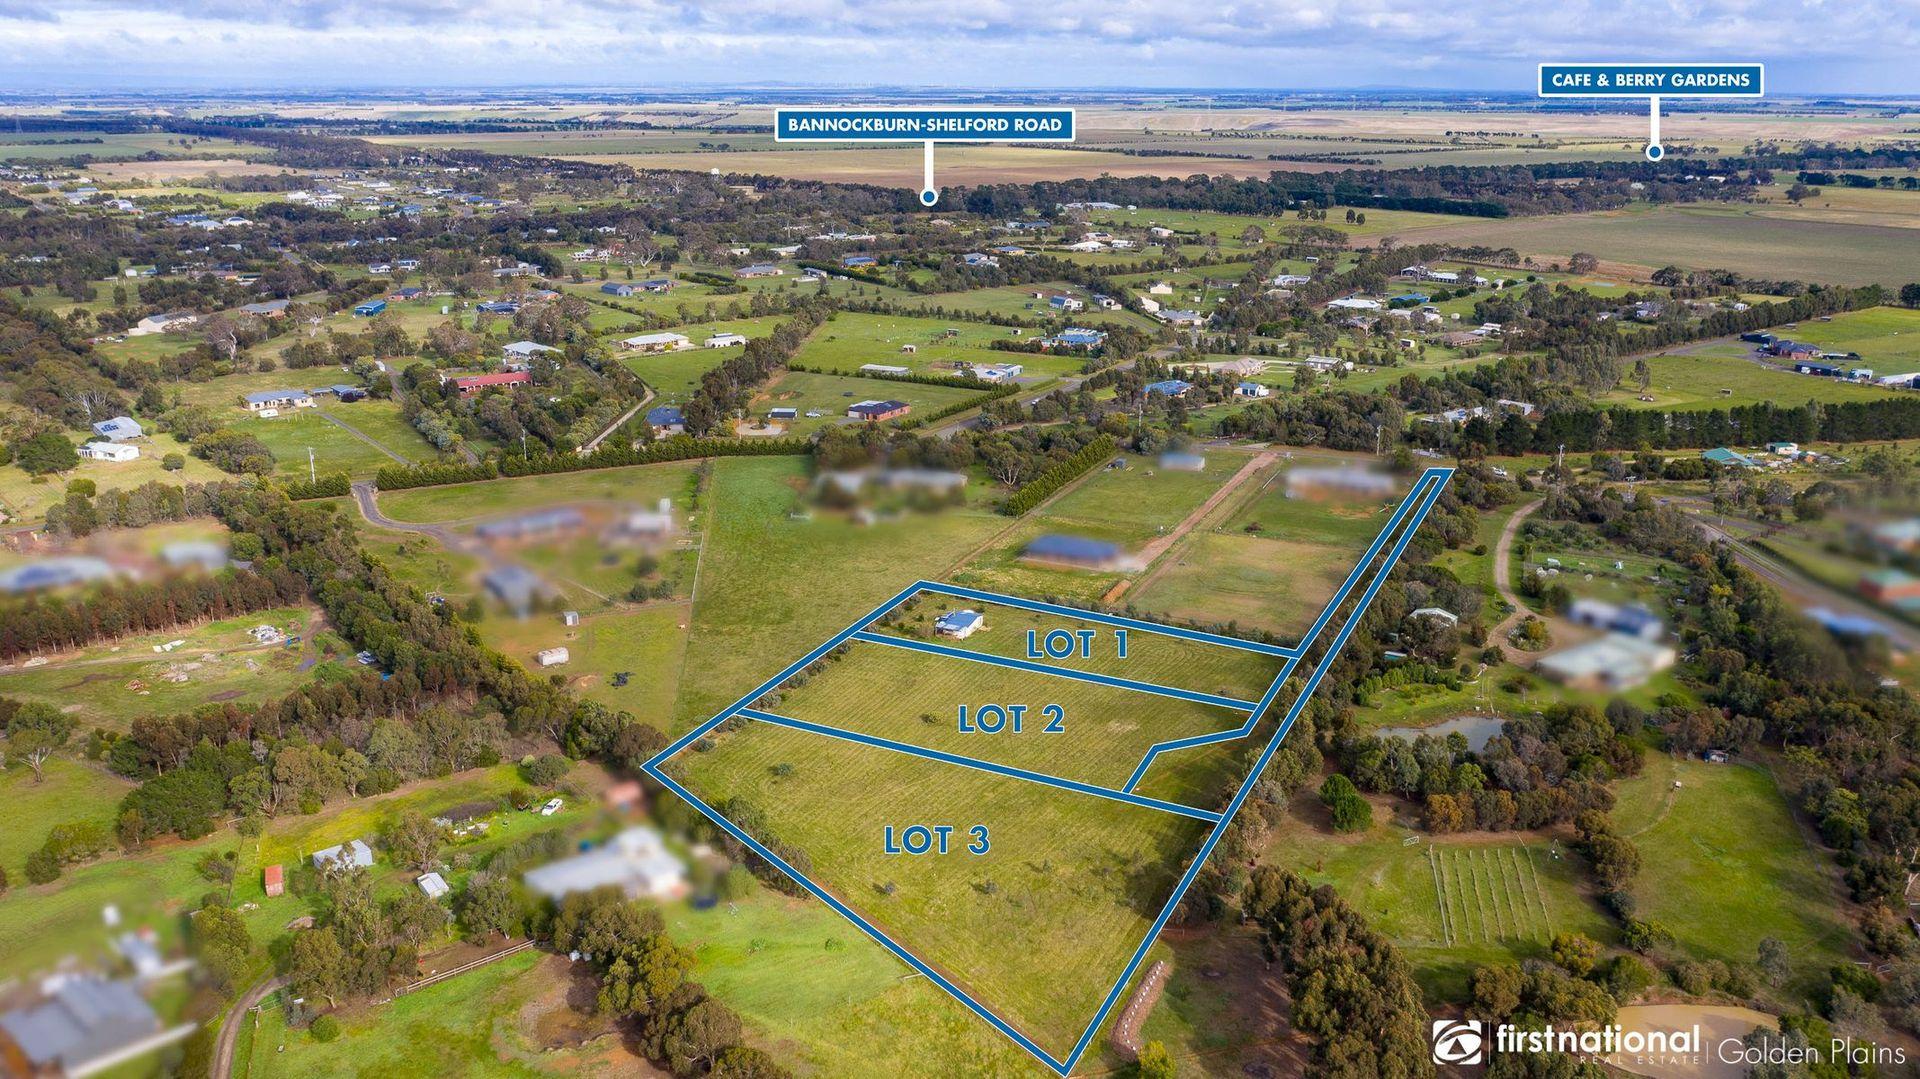 Lot 1, 120 Eagle Court, Teesdale VIC 3328, Image 2